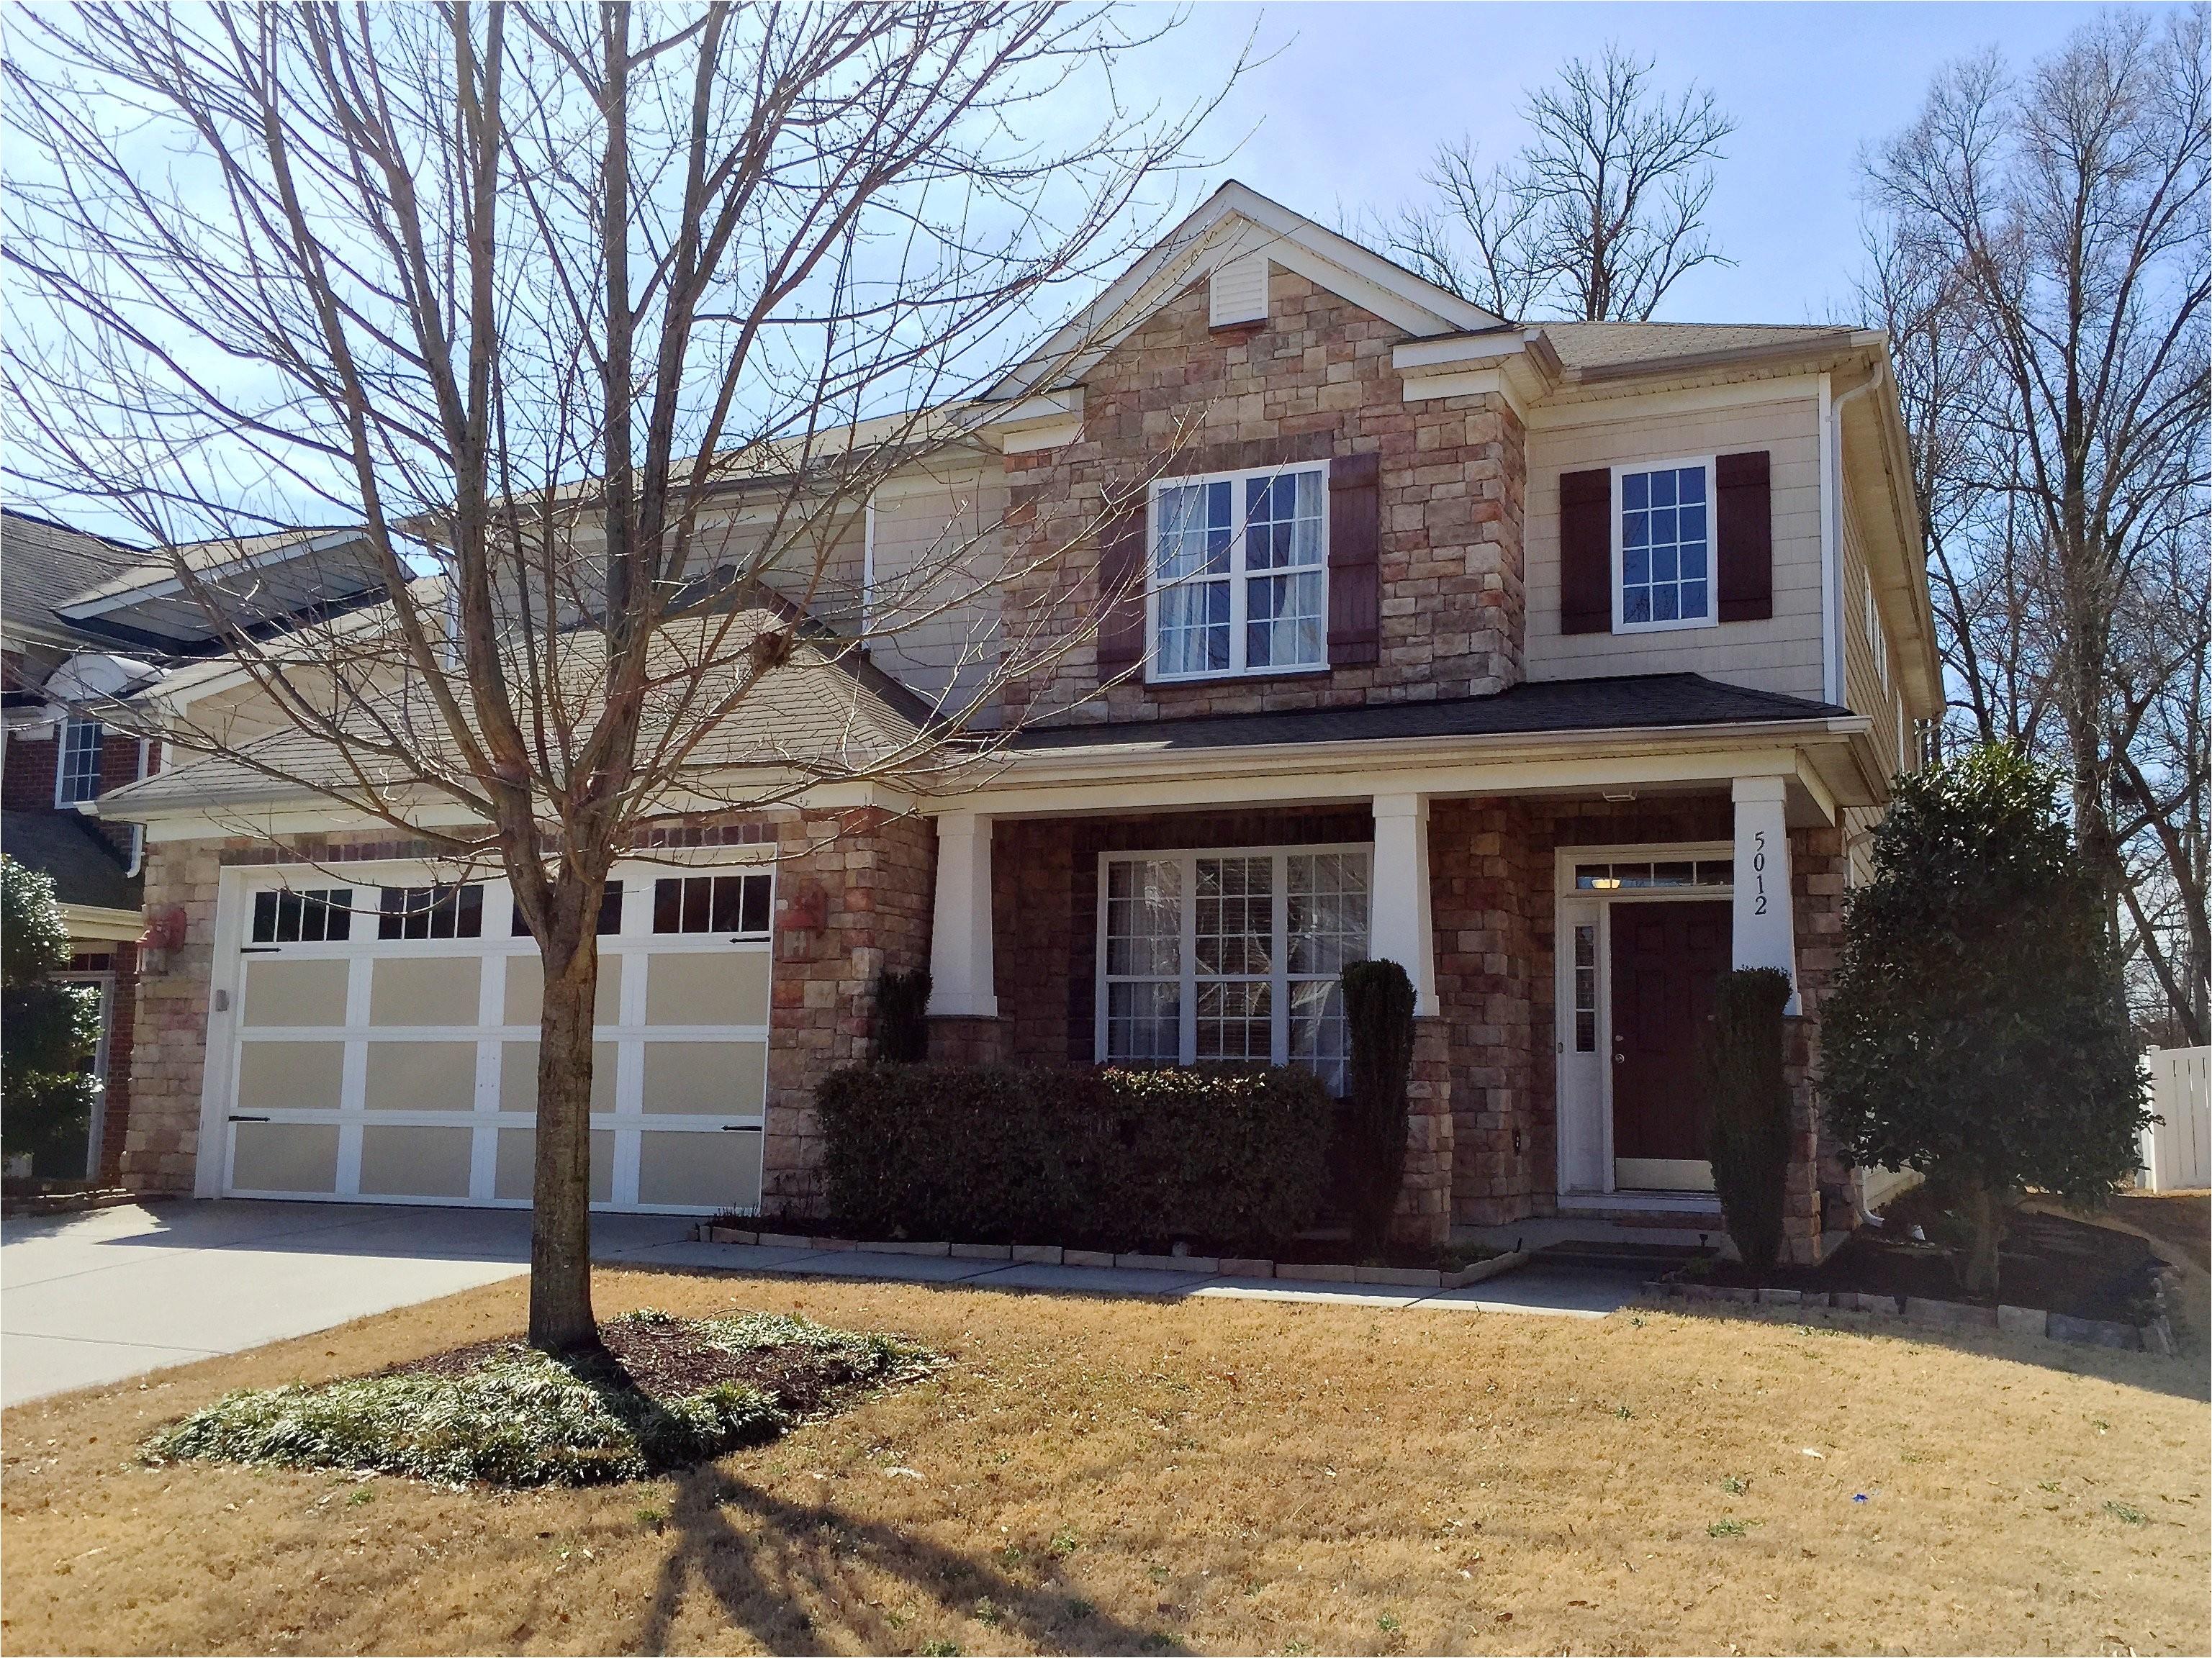 north carolina ranch style homes sale